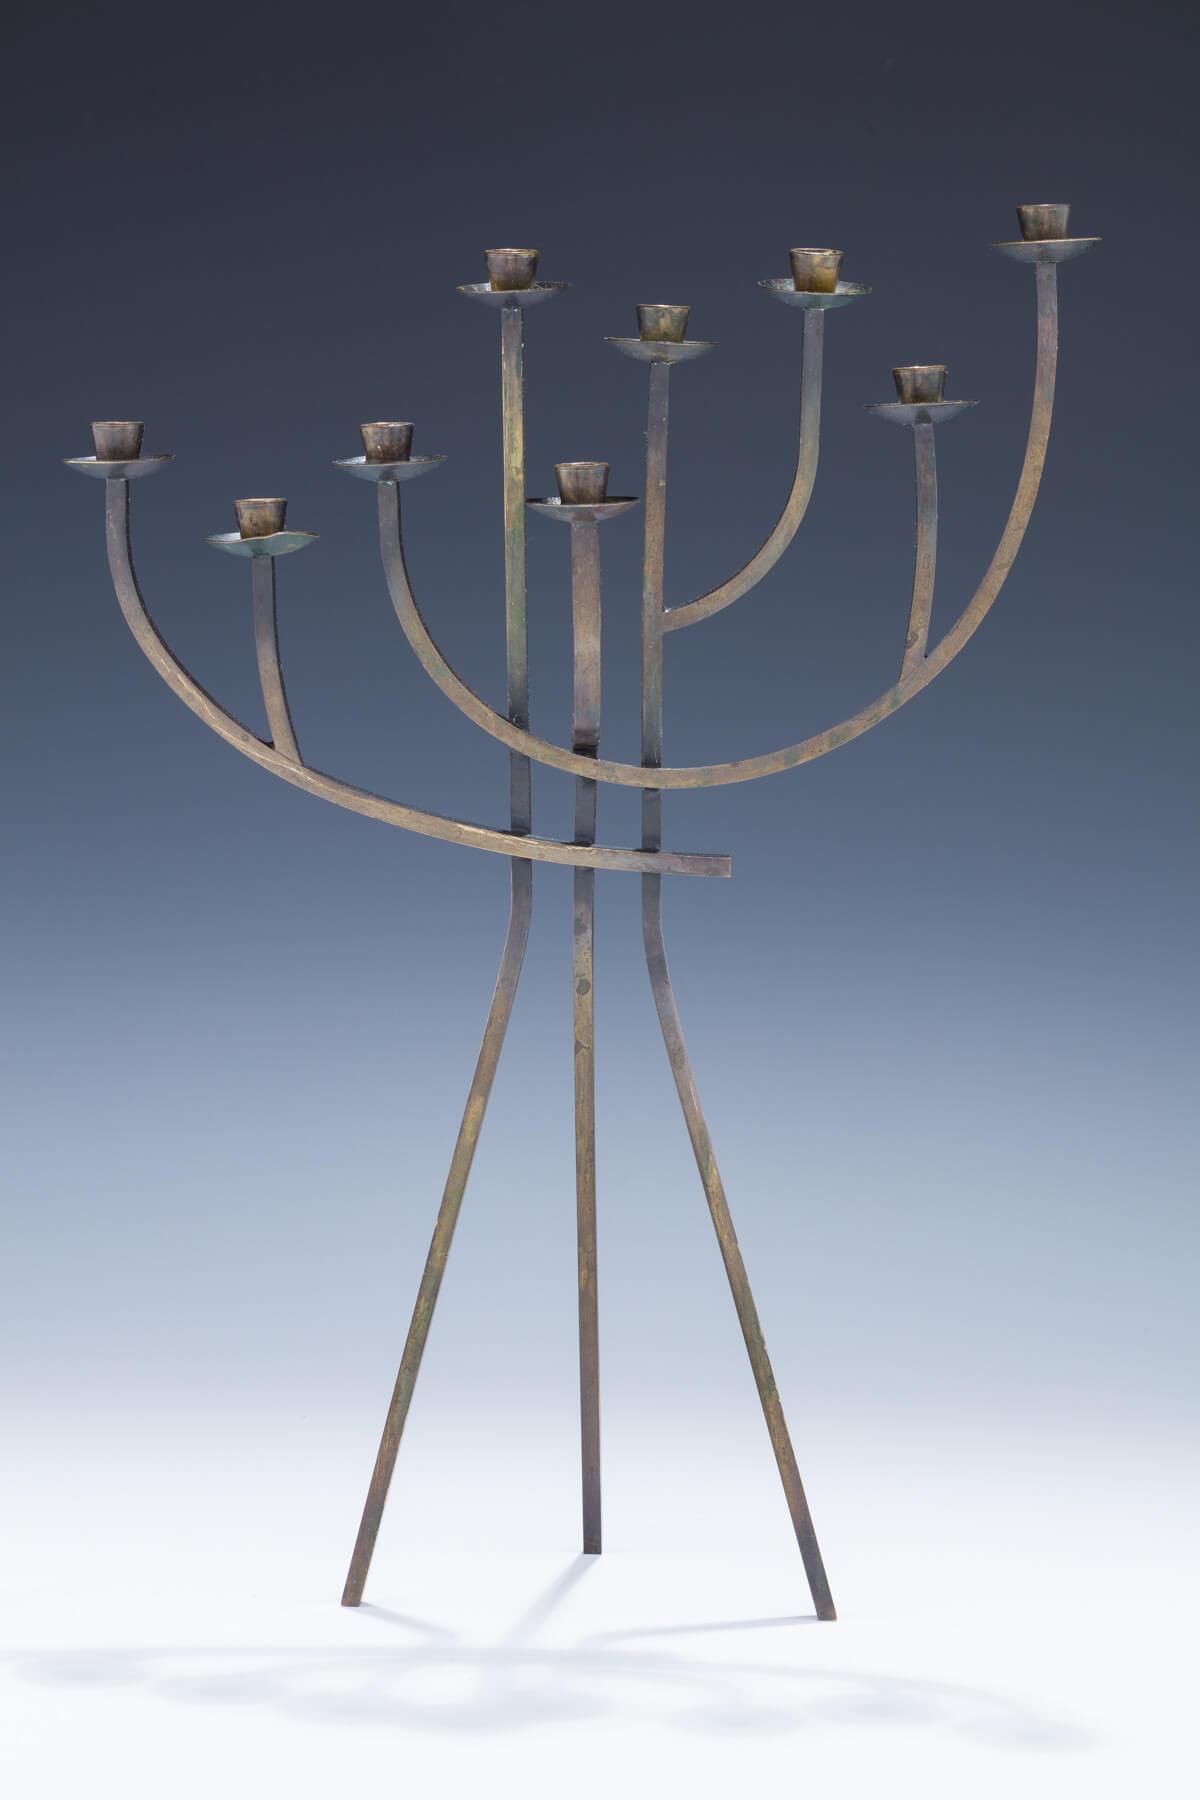 148. A Brass Candelabra/Menorah by Ludwig Wolpert